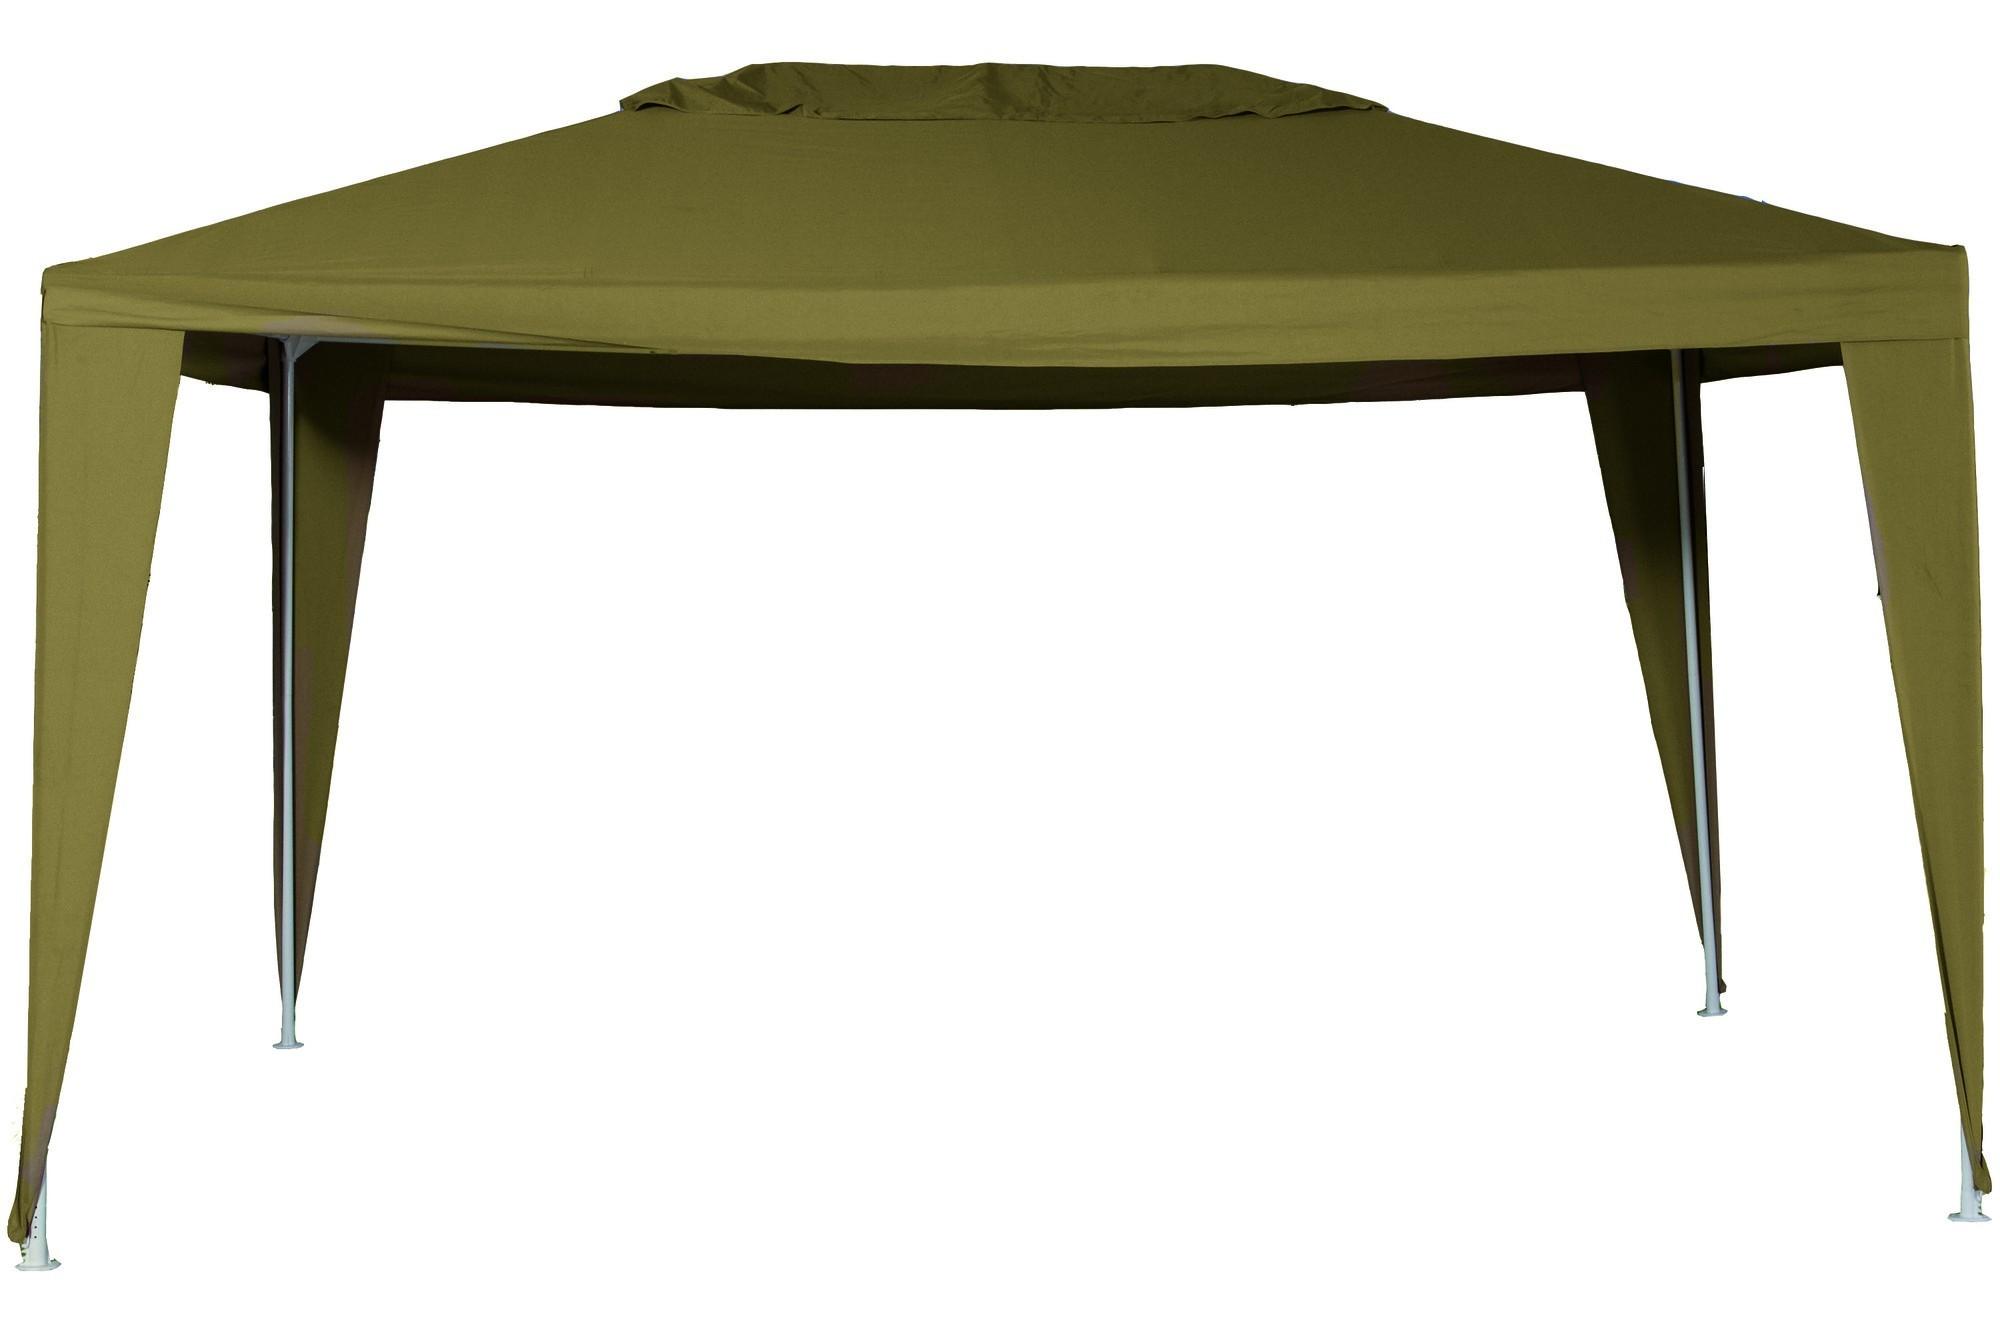 esprit paviljoen 2x3 m taupe garden impressions. Black Bedroom Furniture Sets. Home Design Ideas